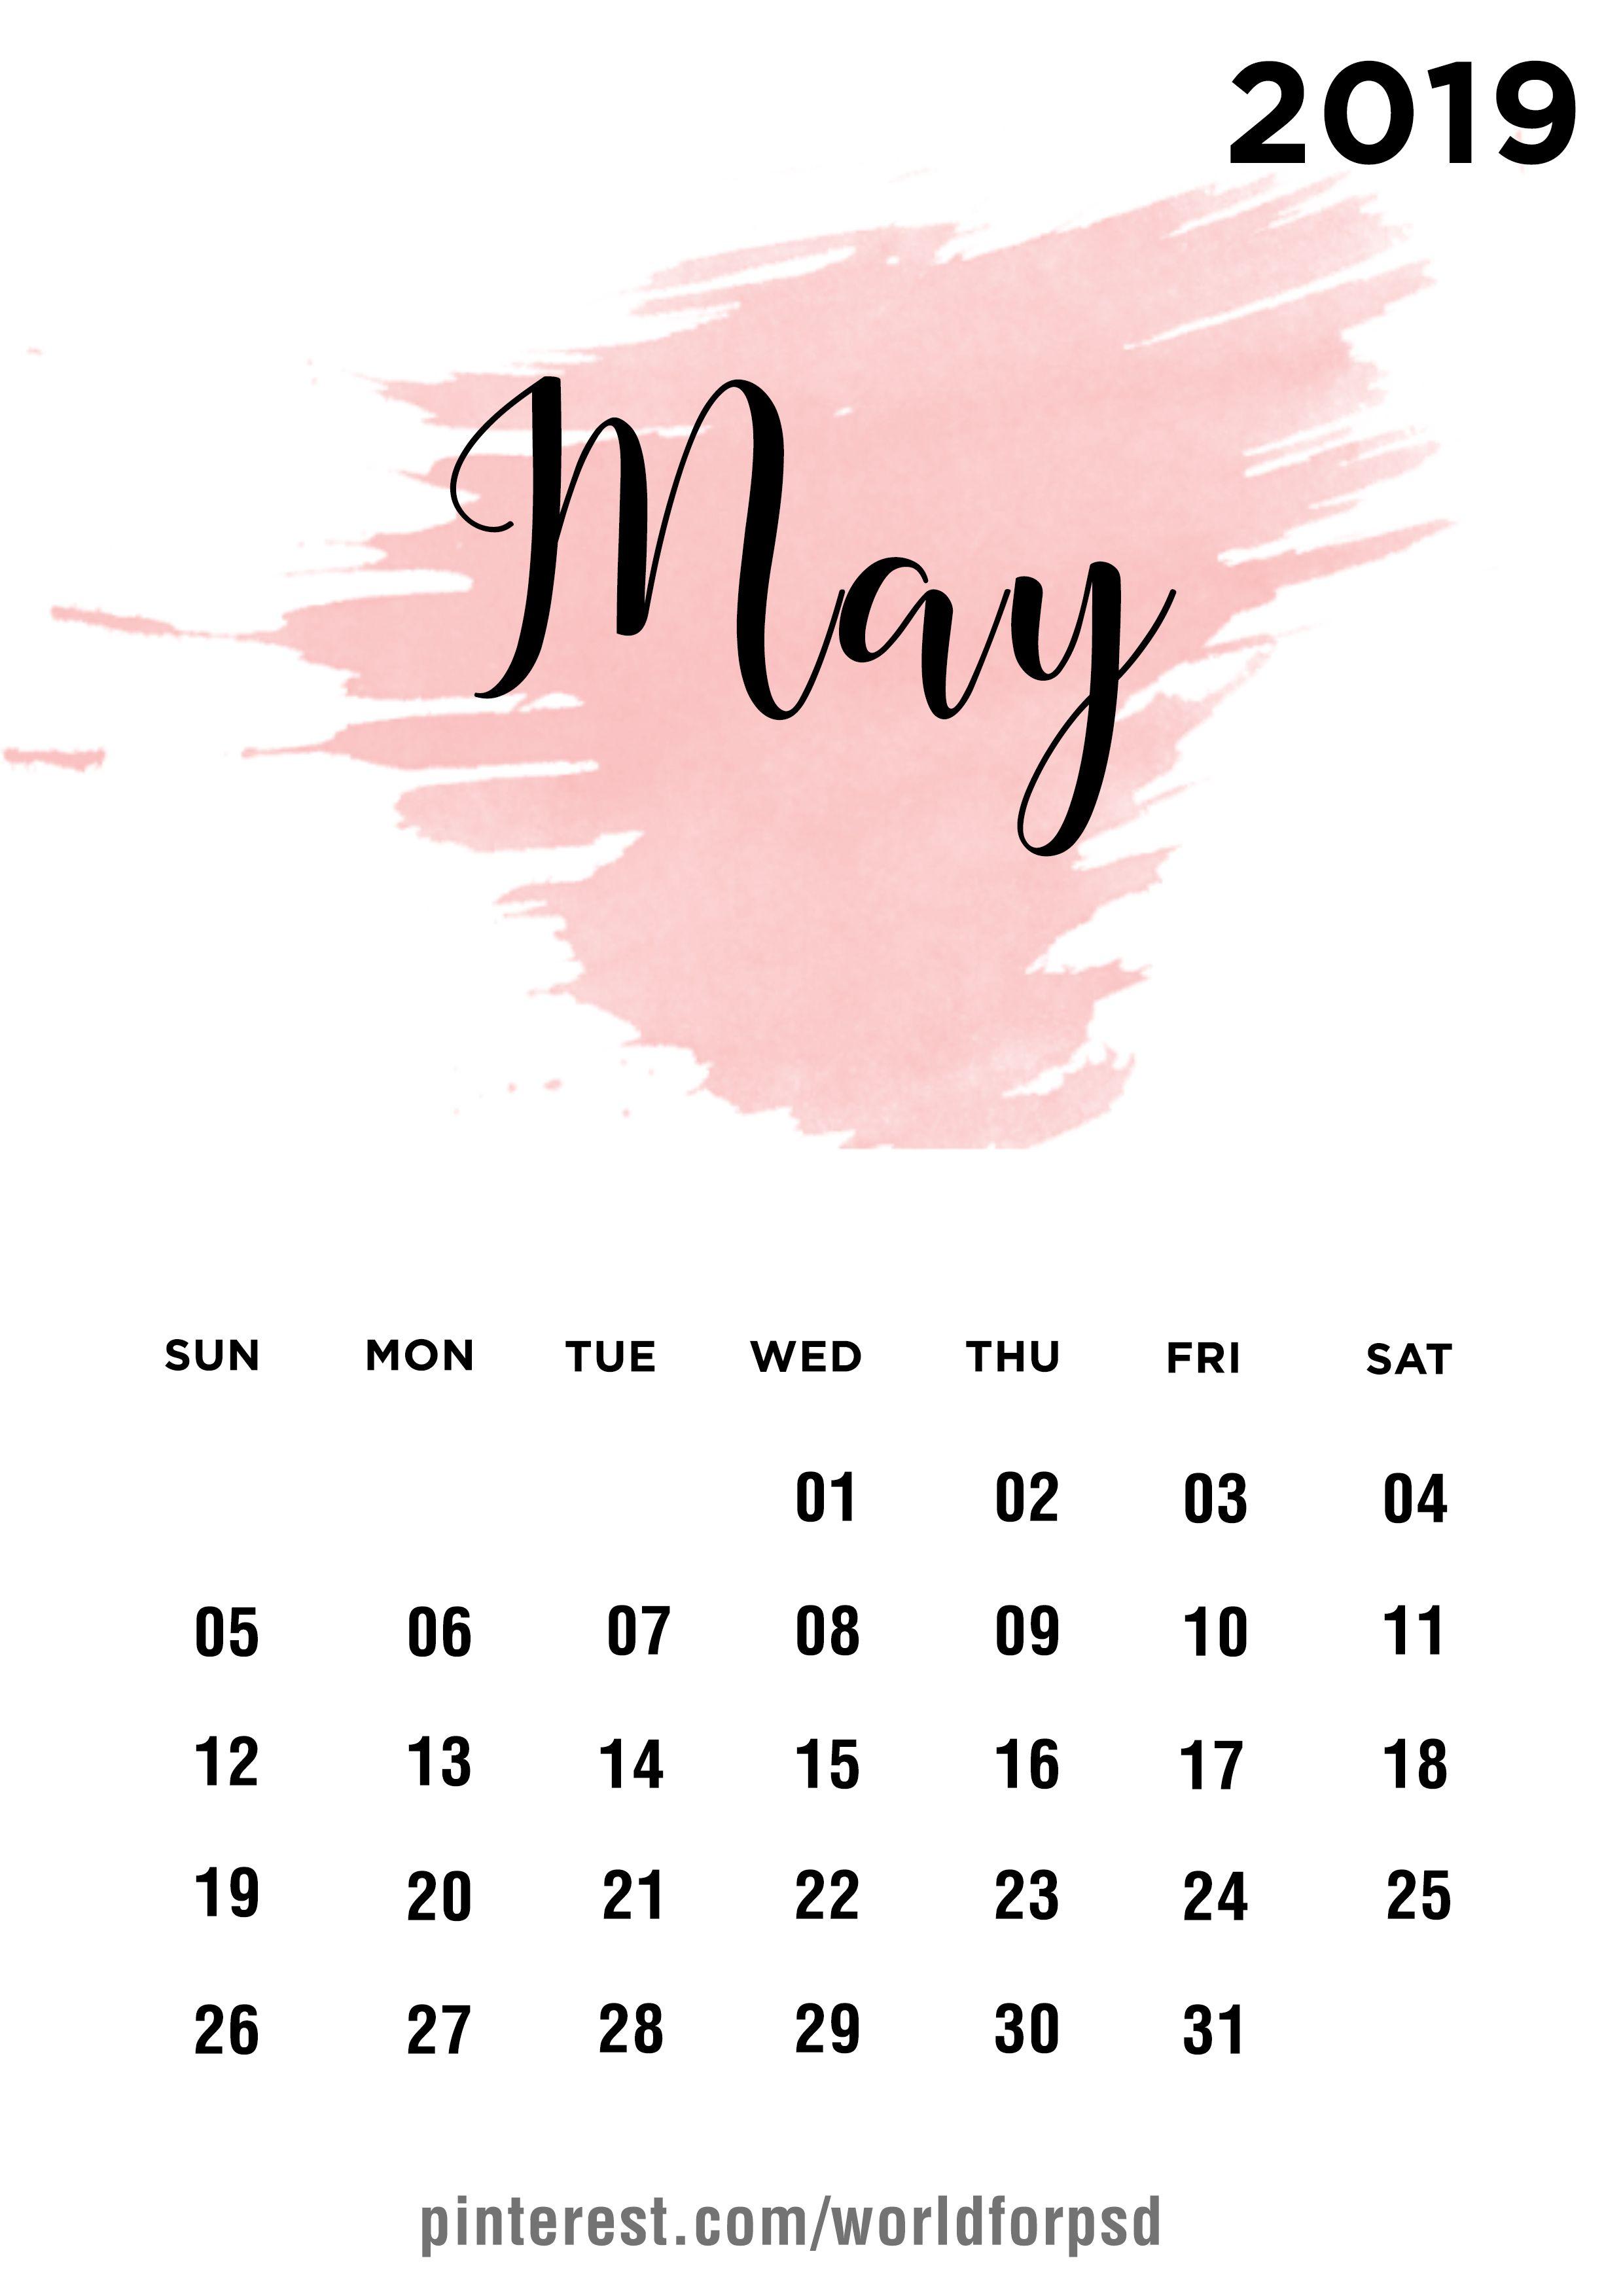 May 2019 Calendar Design Calendar Calendarideas Newyear